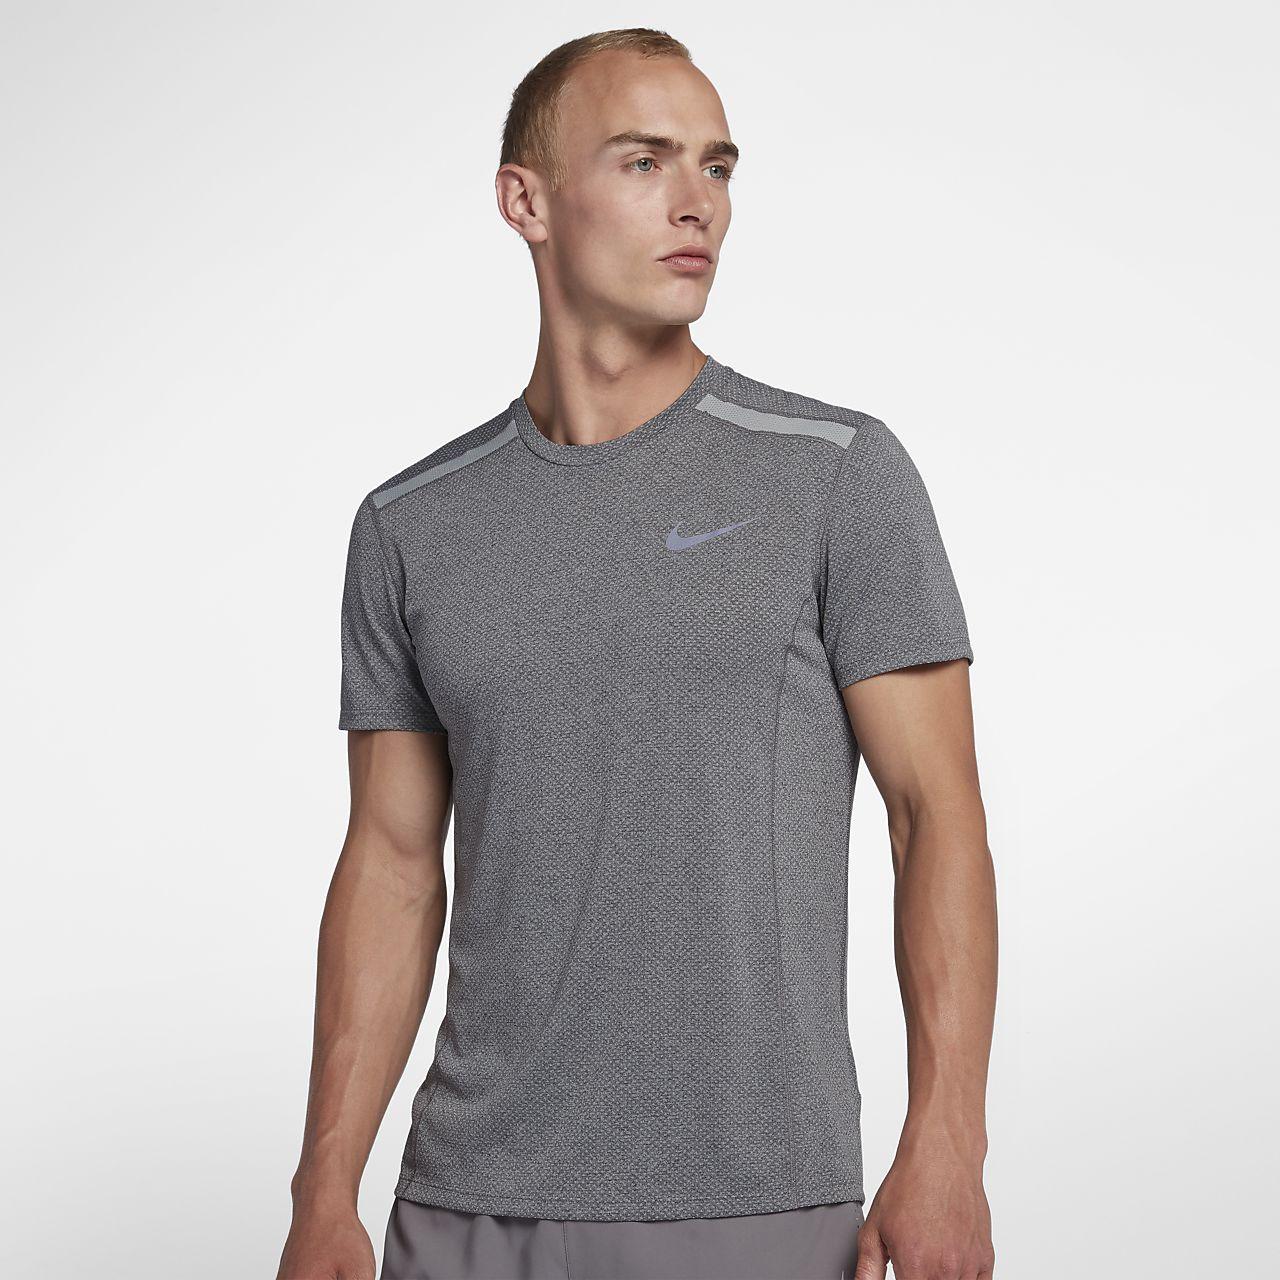 5373873eb Nike Dri-FIT Miler Cool Men's Short-Sleeve Running Top. Nike.com AU